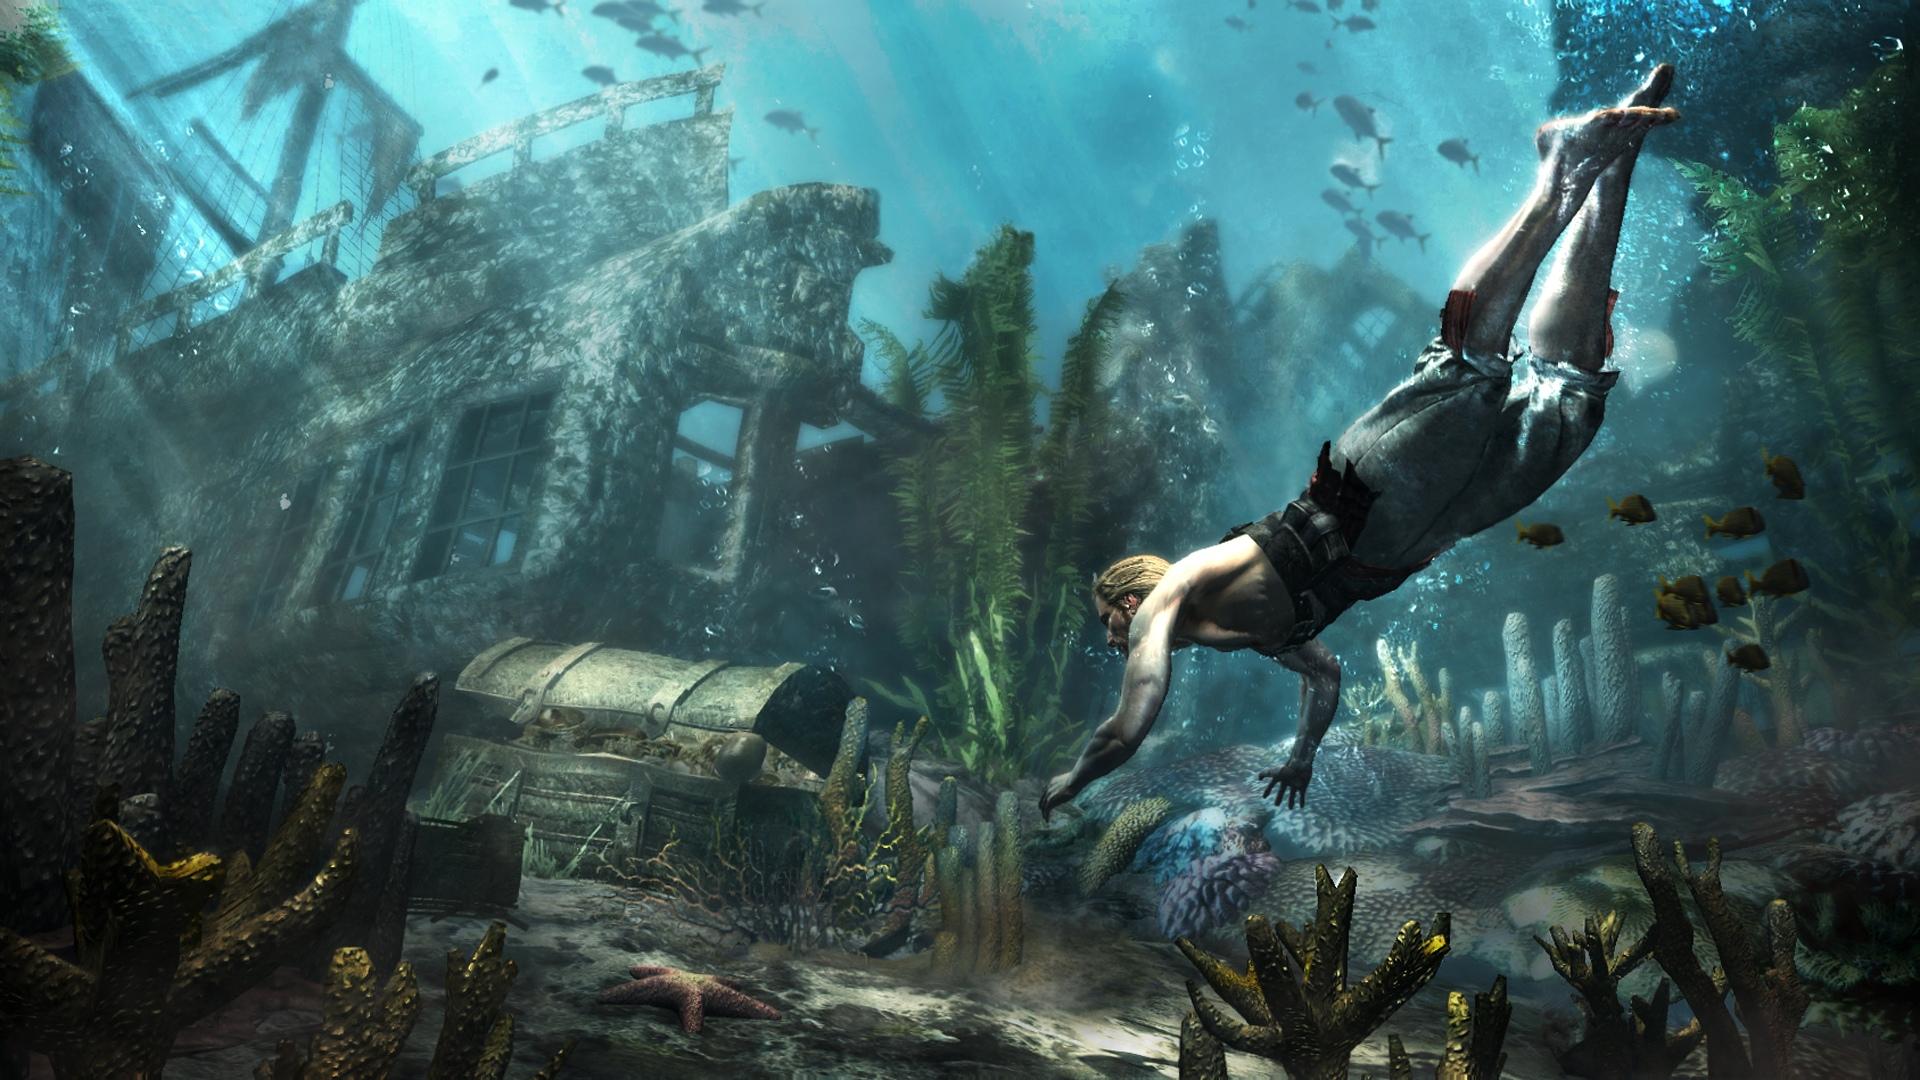 Скриншот игры Assassins Creed 4 Black Flag